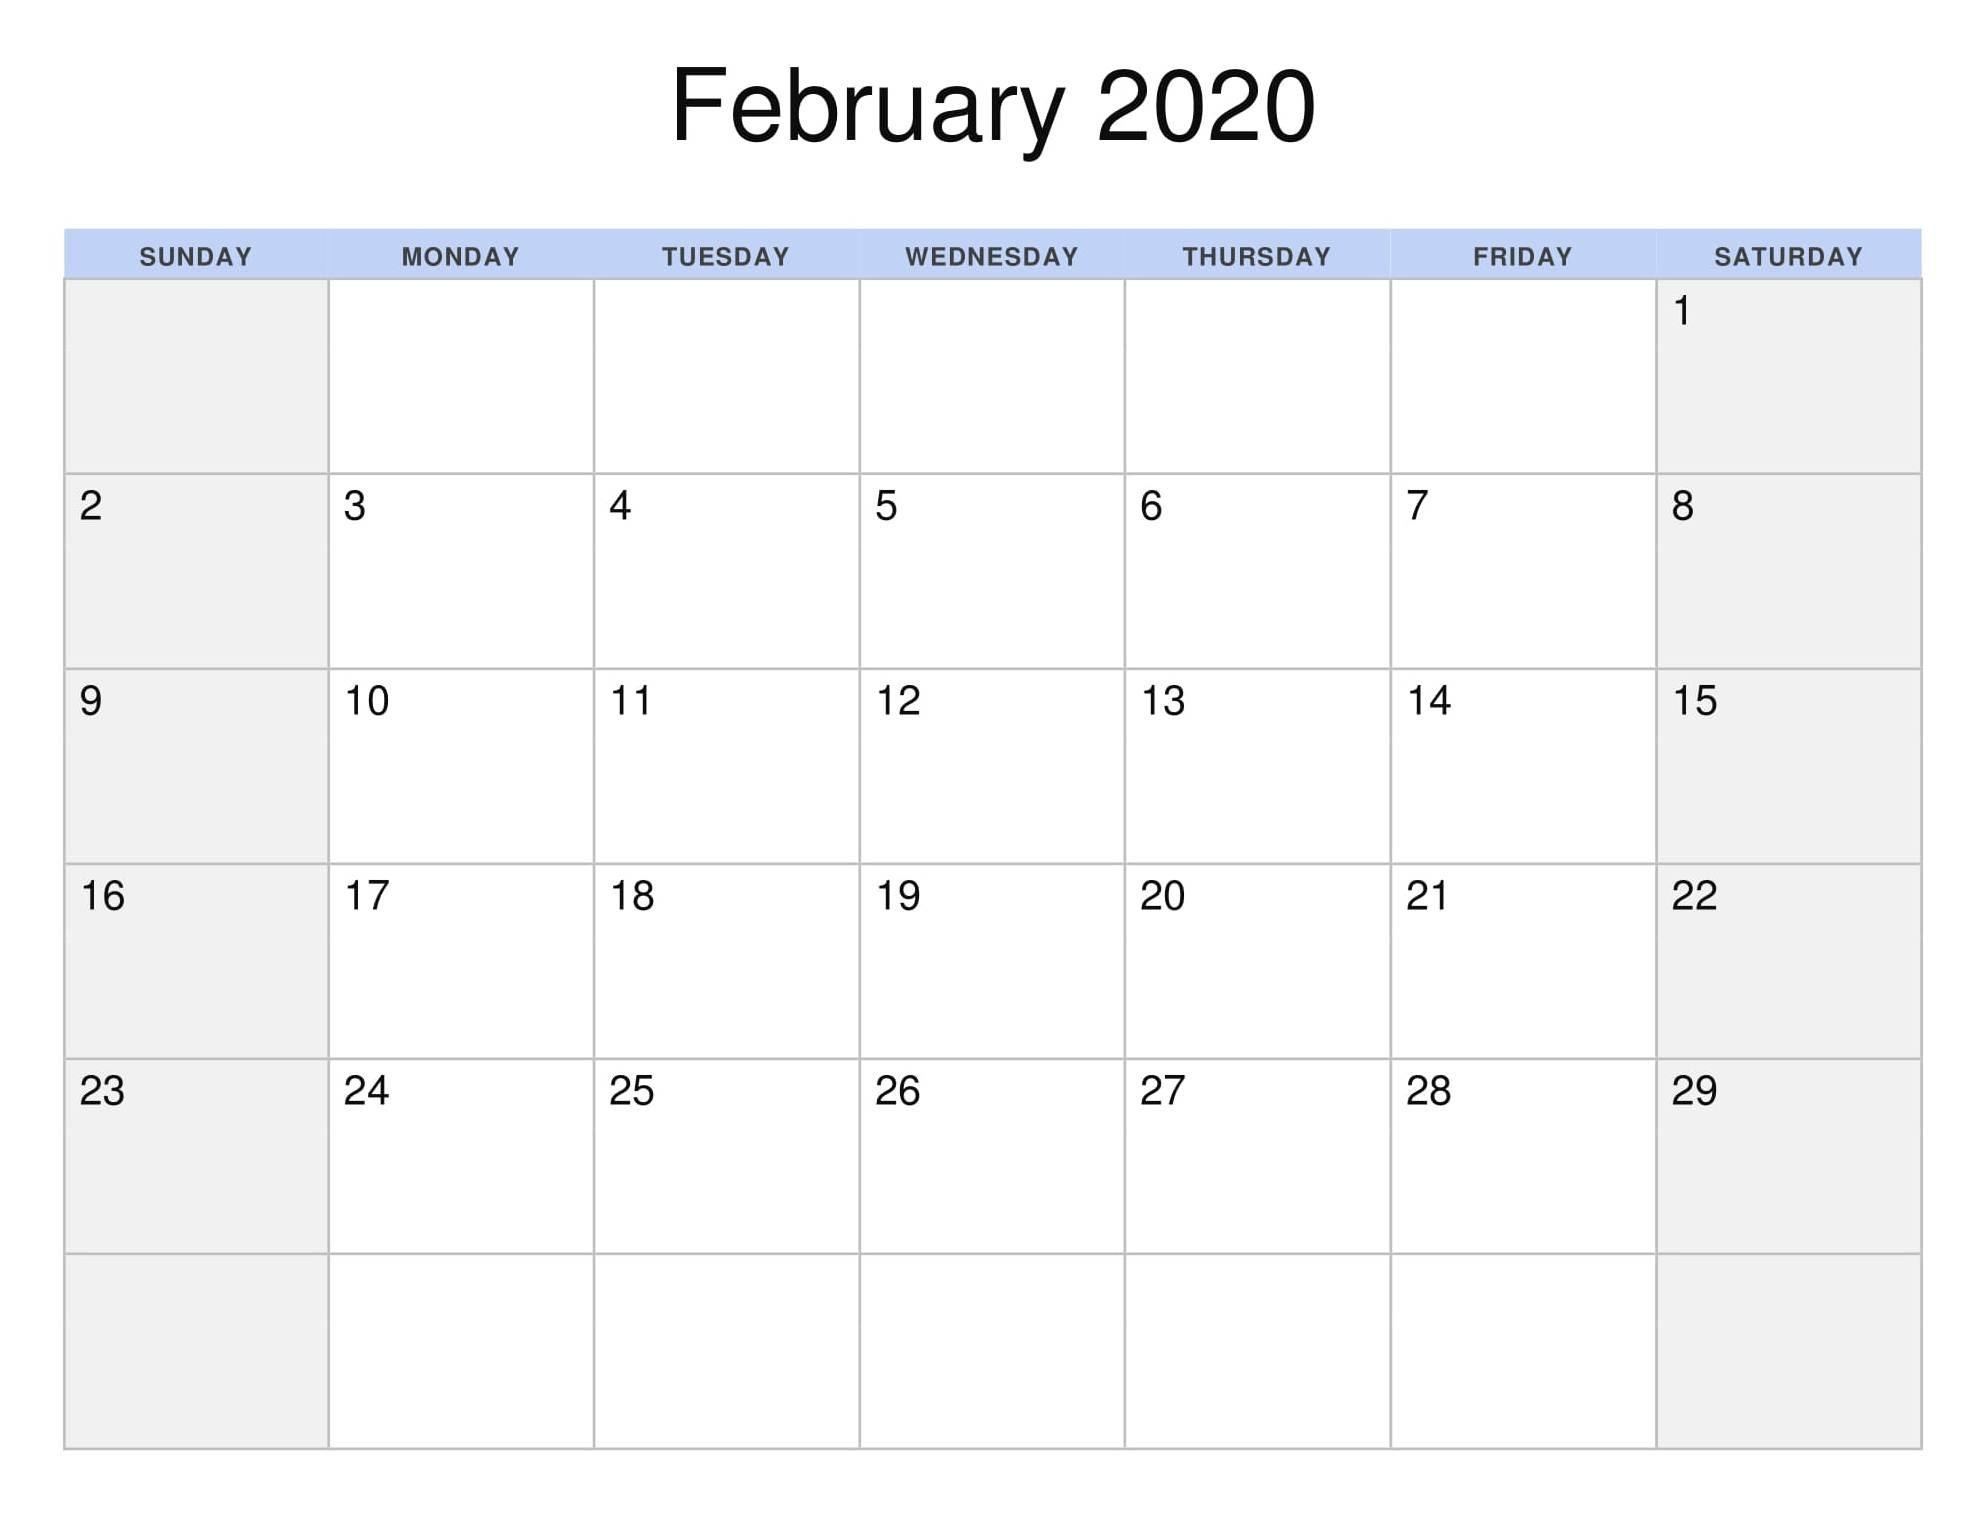 Calendar For February 2020 Holiday Template  2019 Calendars throughout February 2020 Daily Calendar